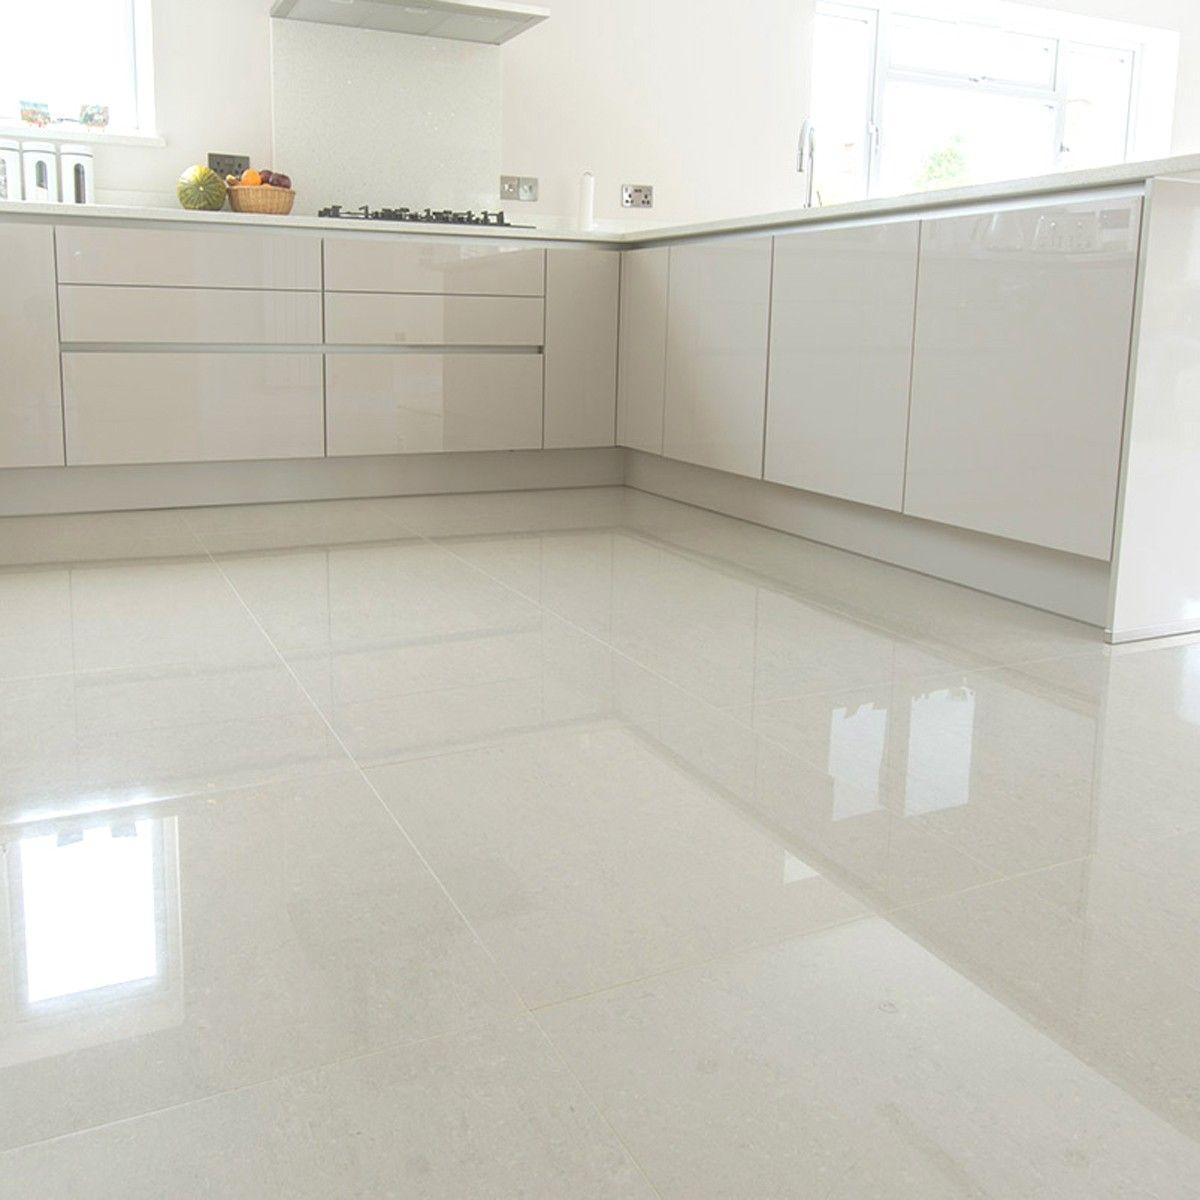 white kitchen floors oil rubbed bronze island lighting crown tiles 60x60cm super polished ivory porcelain